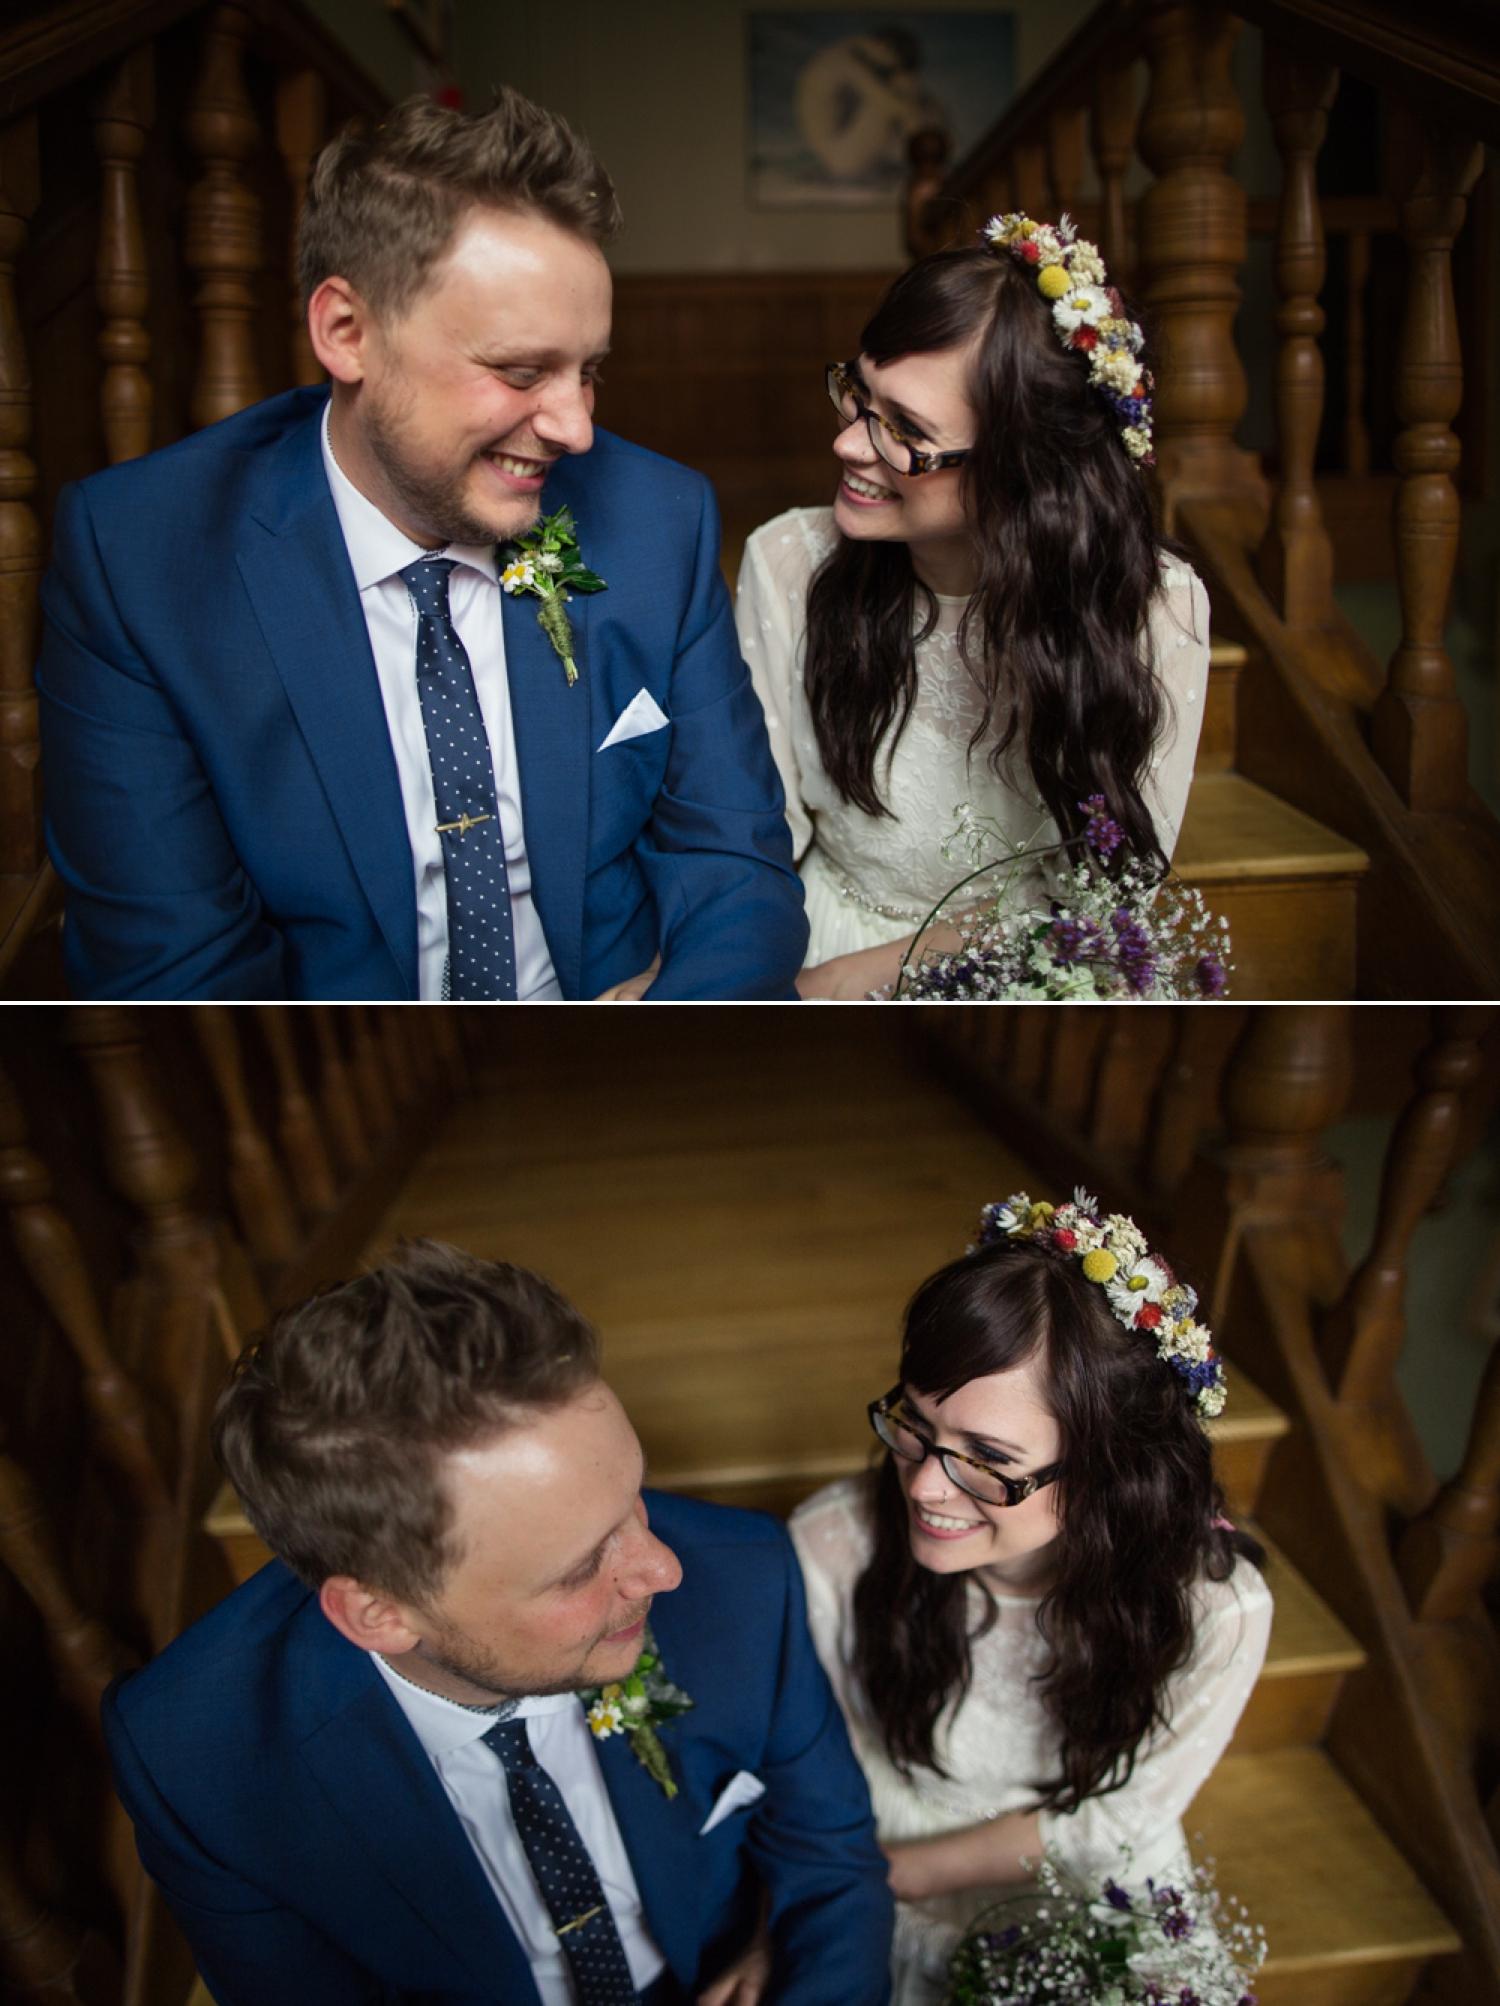 Somerset Wedding Photographer Elly & Liam_0026.jpg